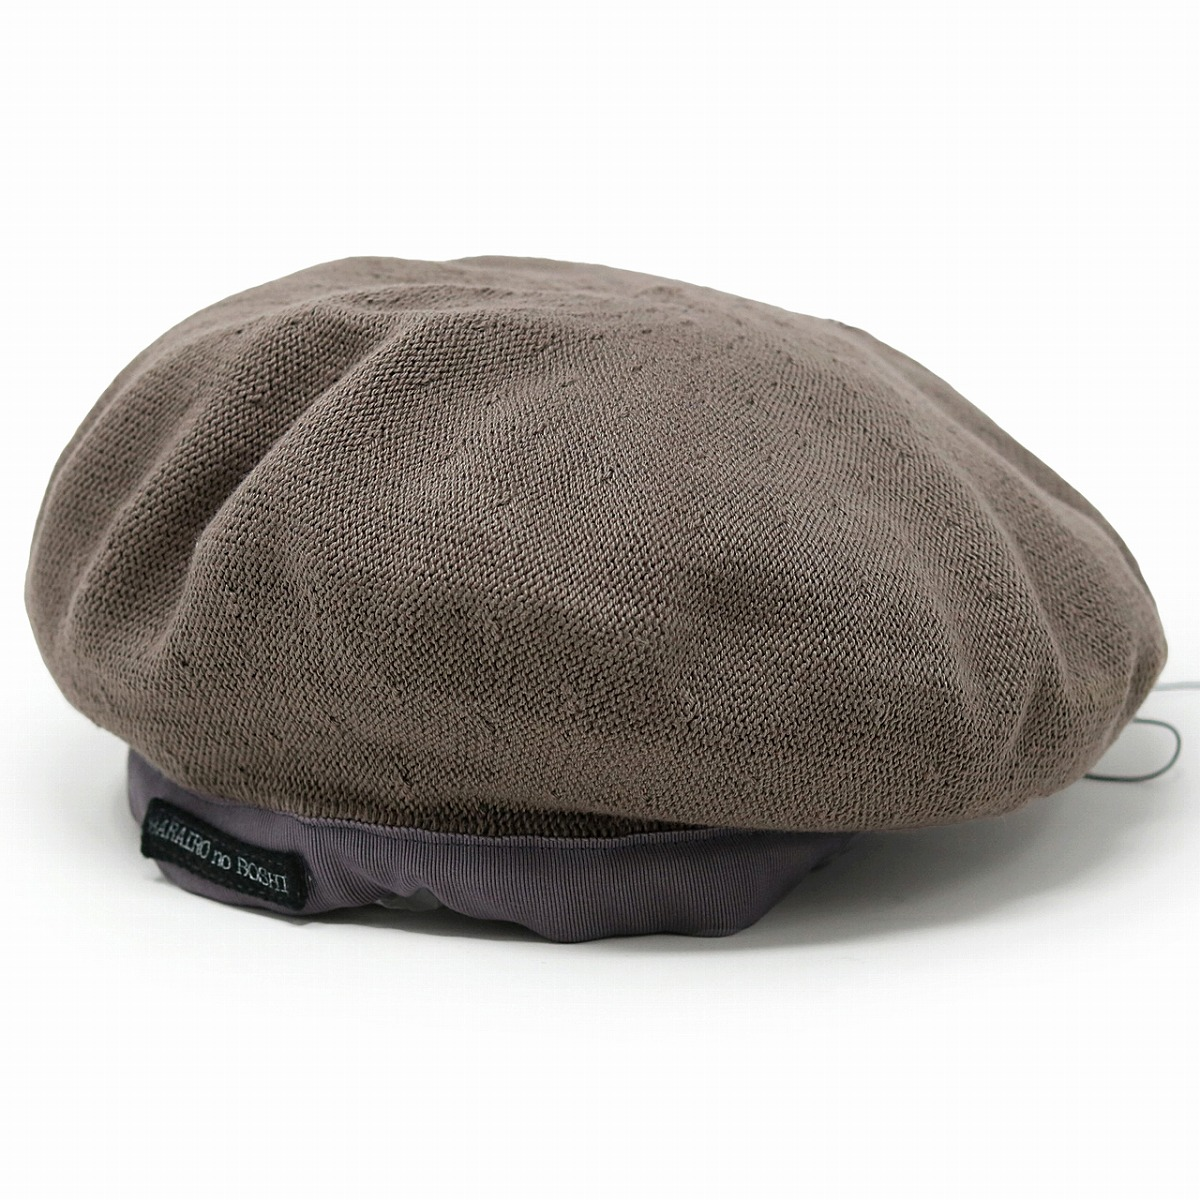 Hat army beret fashion adjustable size size adjustment Barairo no Boushi  cotton 100 / tea cafe au lait [beret] of the entering beret natural Shin  pull